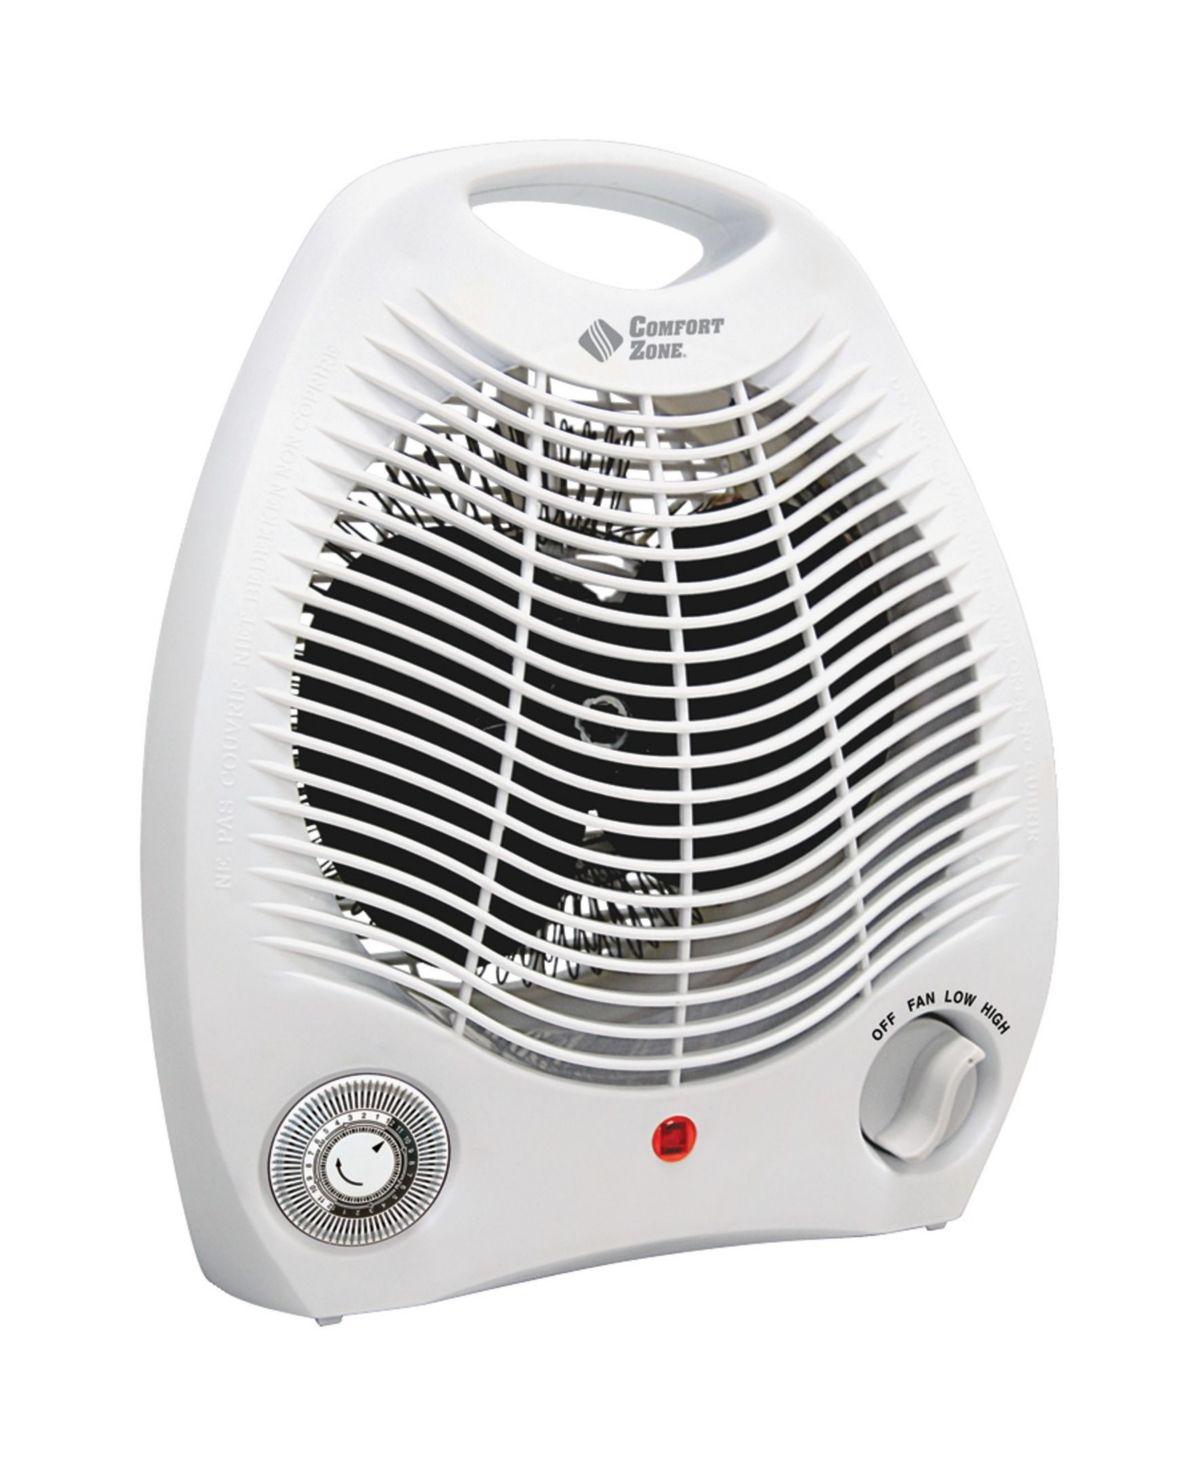 Comfort Zone Cz40 Compact Heater/Fan & Reviews Wellness